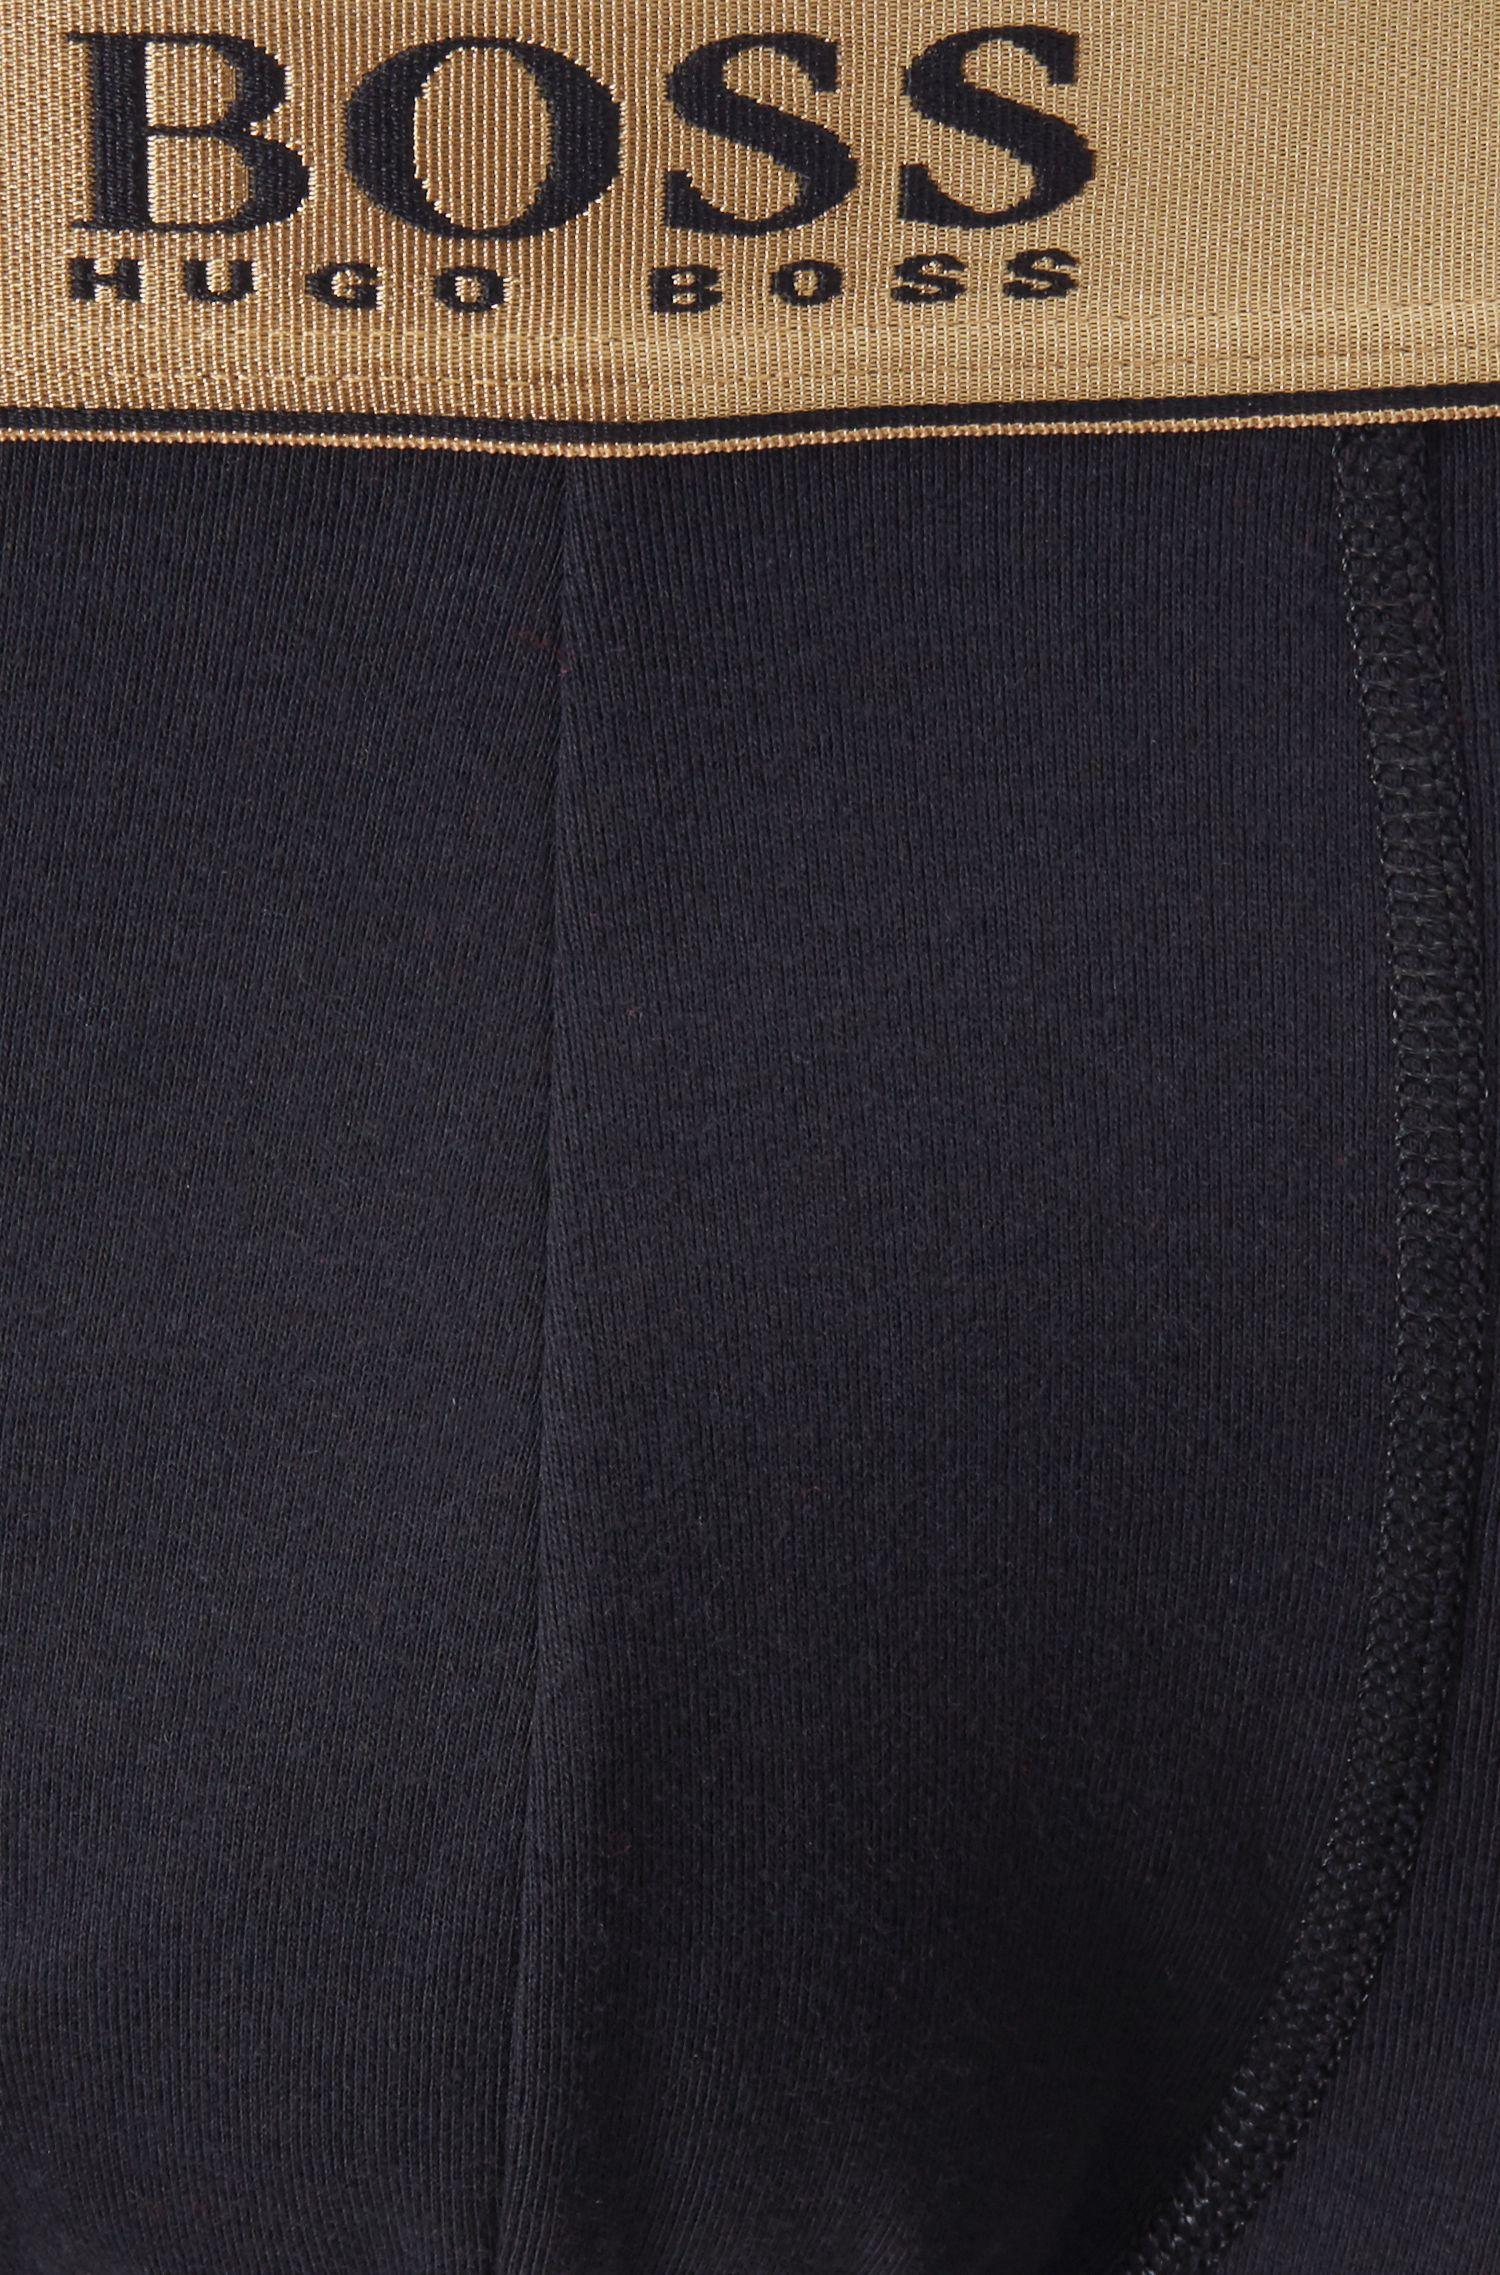 Set de regalo de calzoncillos bóxer de algodón con cintura de aspecto metalizado, Rojo